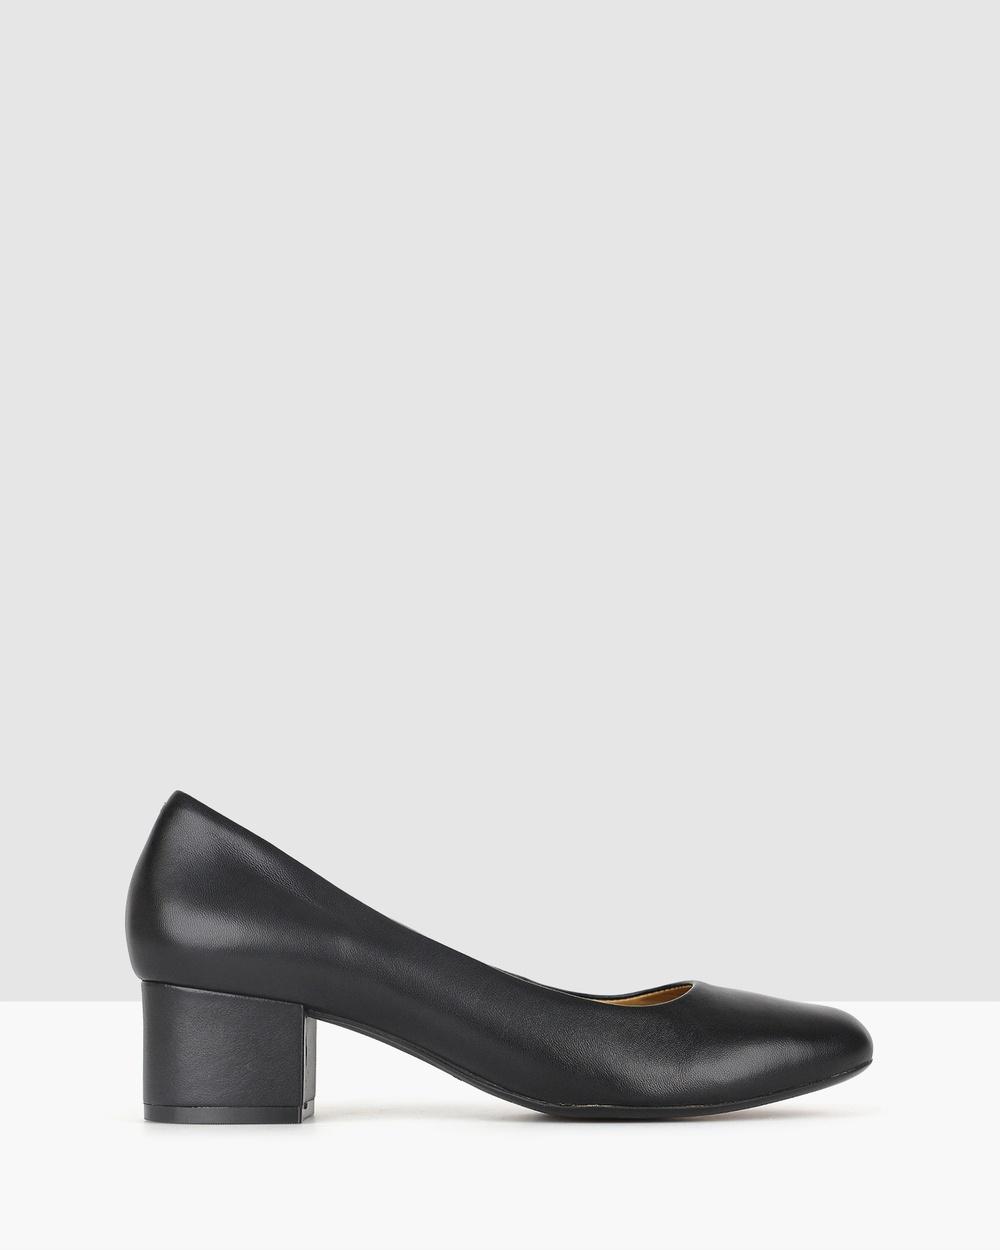 Airflex Cherish Leather Block Heel Pumps All Black